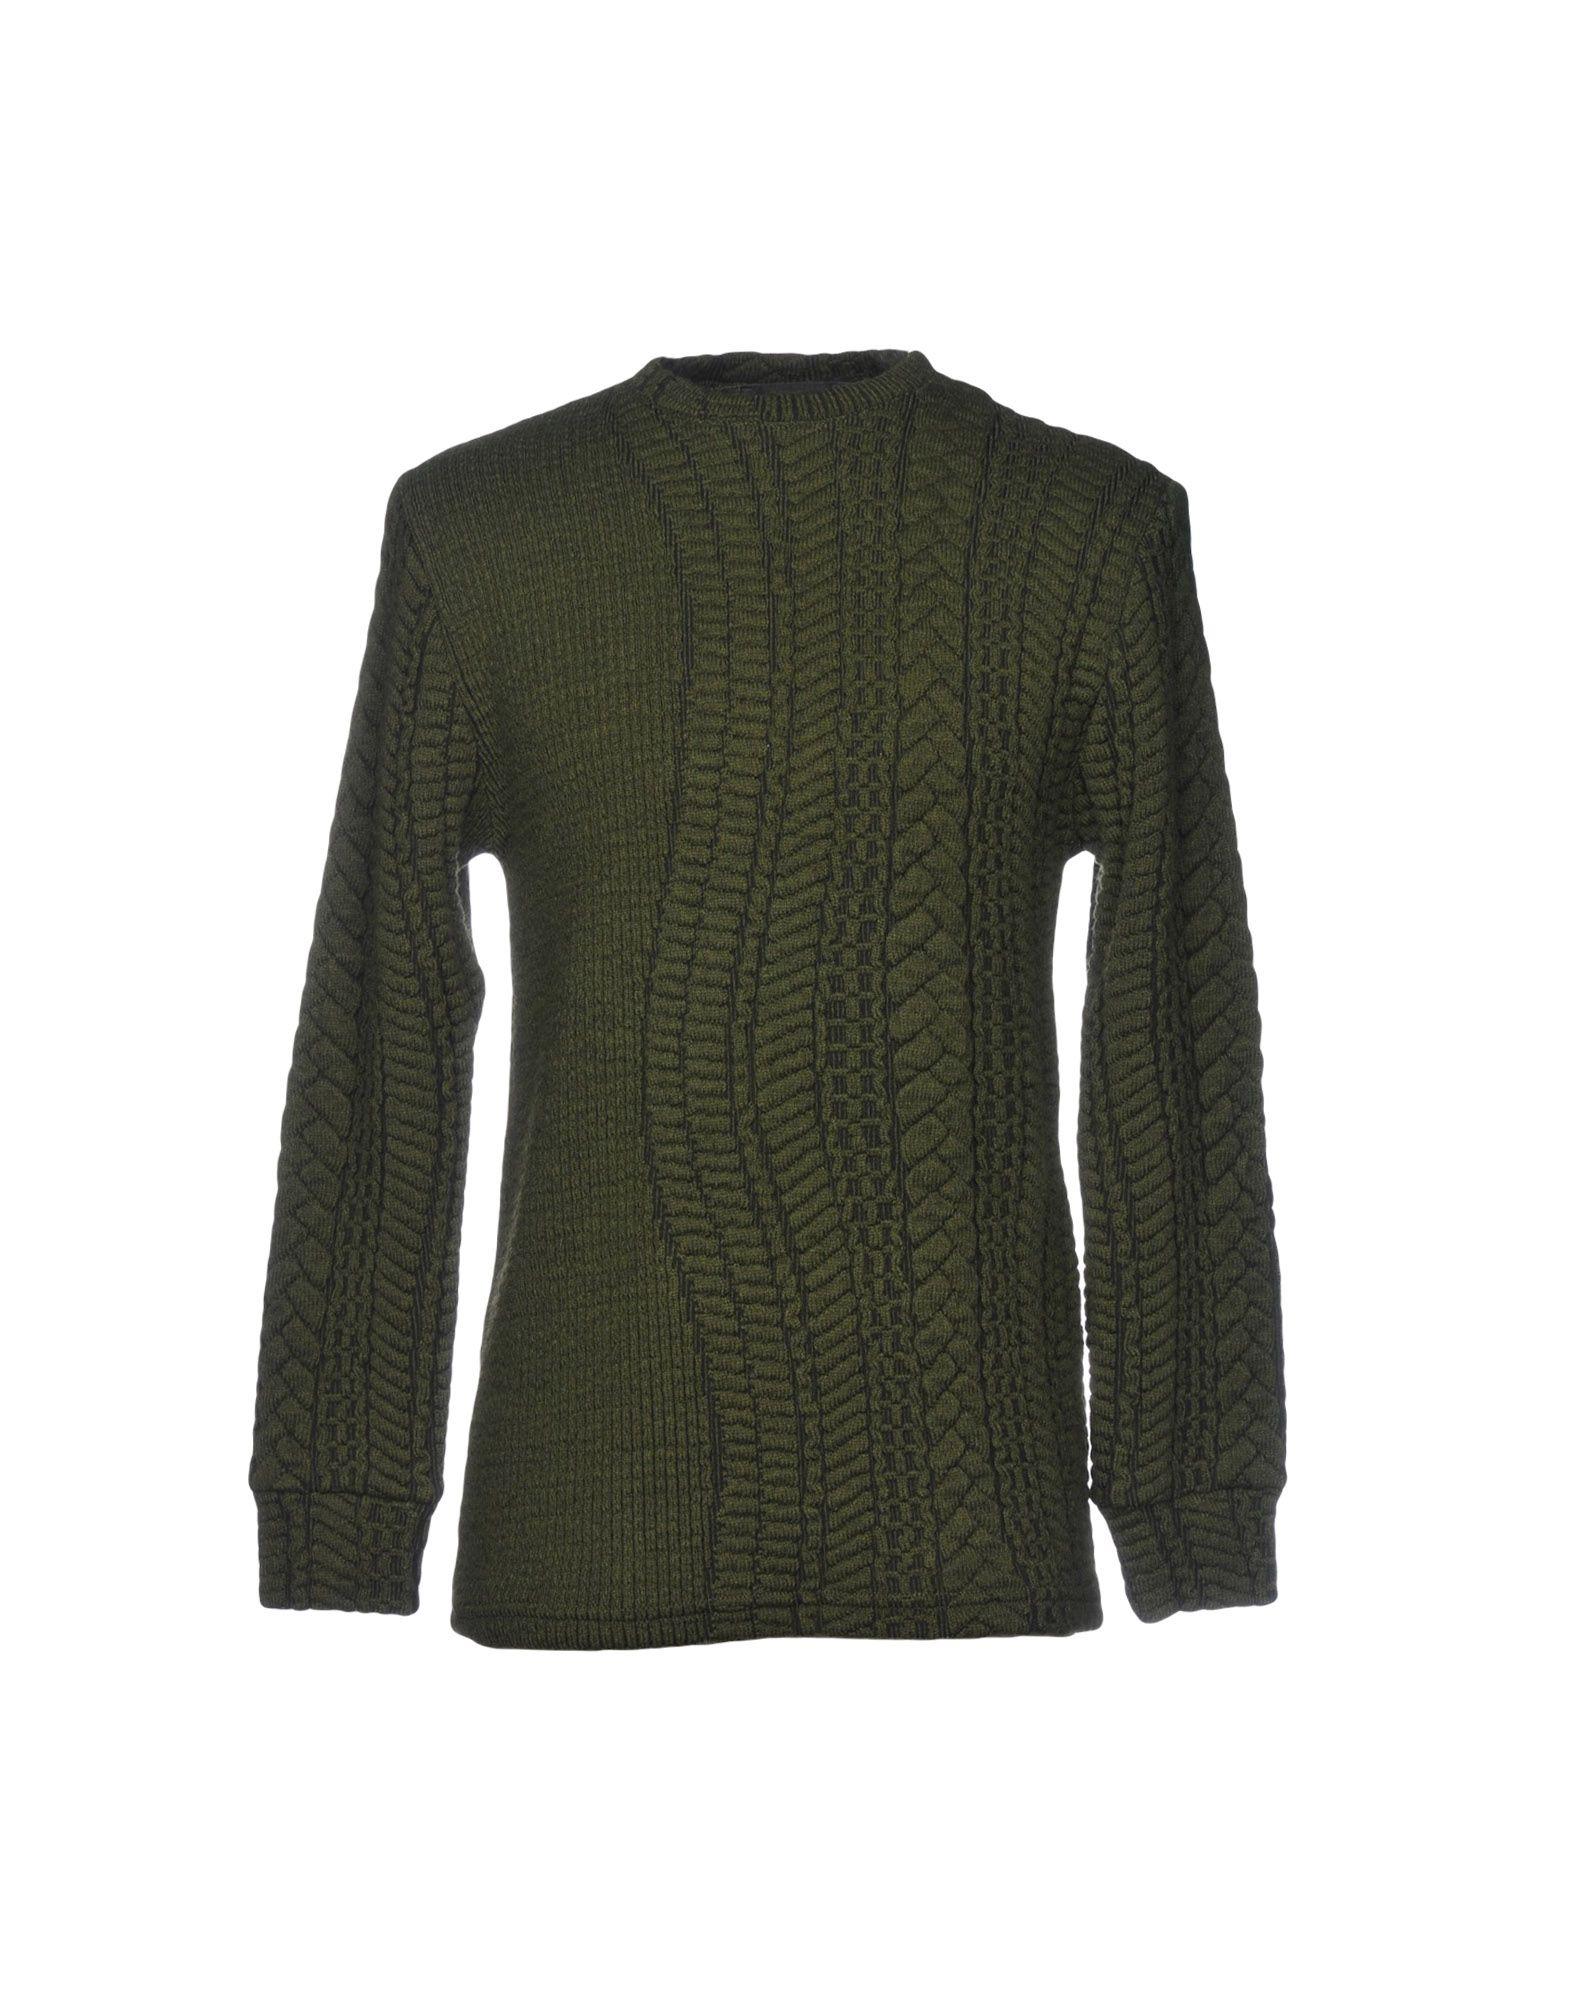 NUMERO 00 Sweater in Military Green